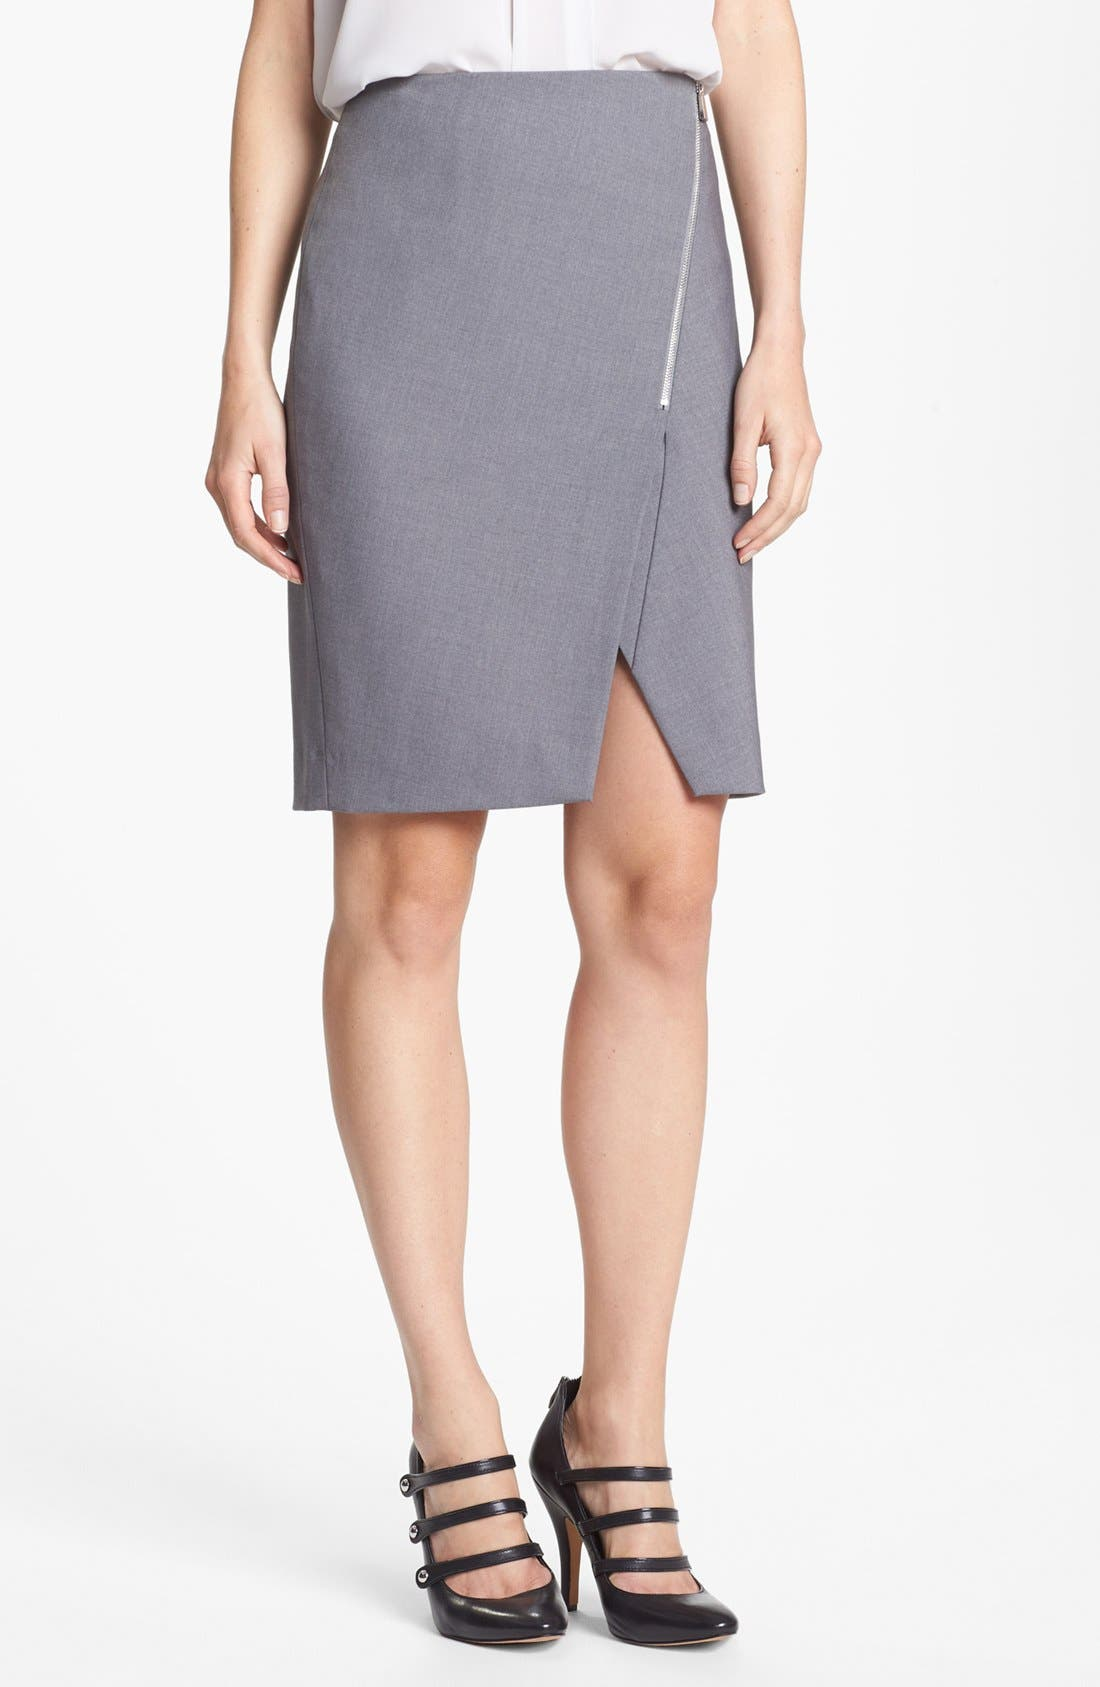 Alternate Image 1 Selected - Vince Camuto Asymmetrical Zip Skirt